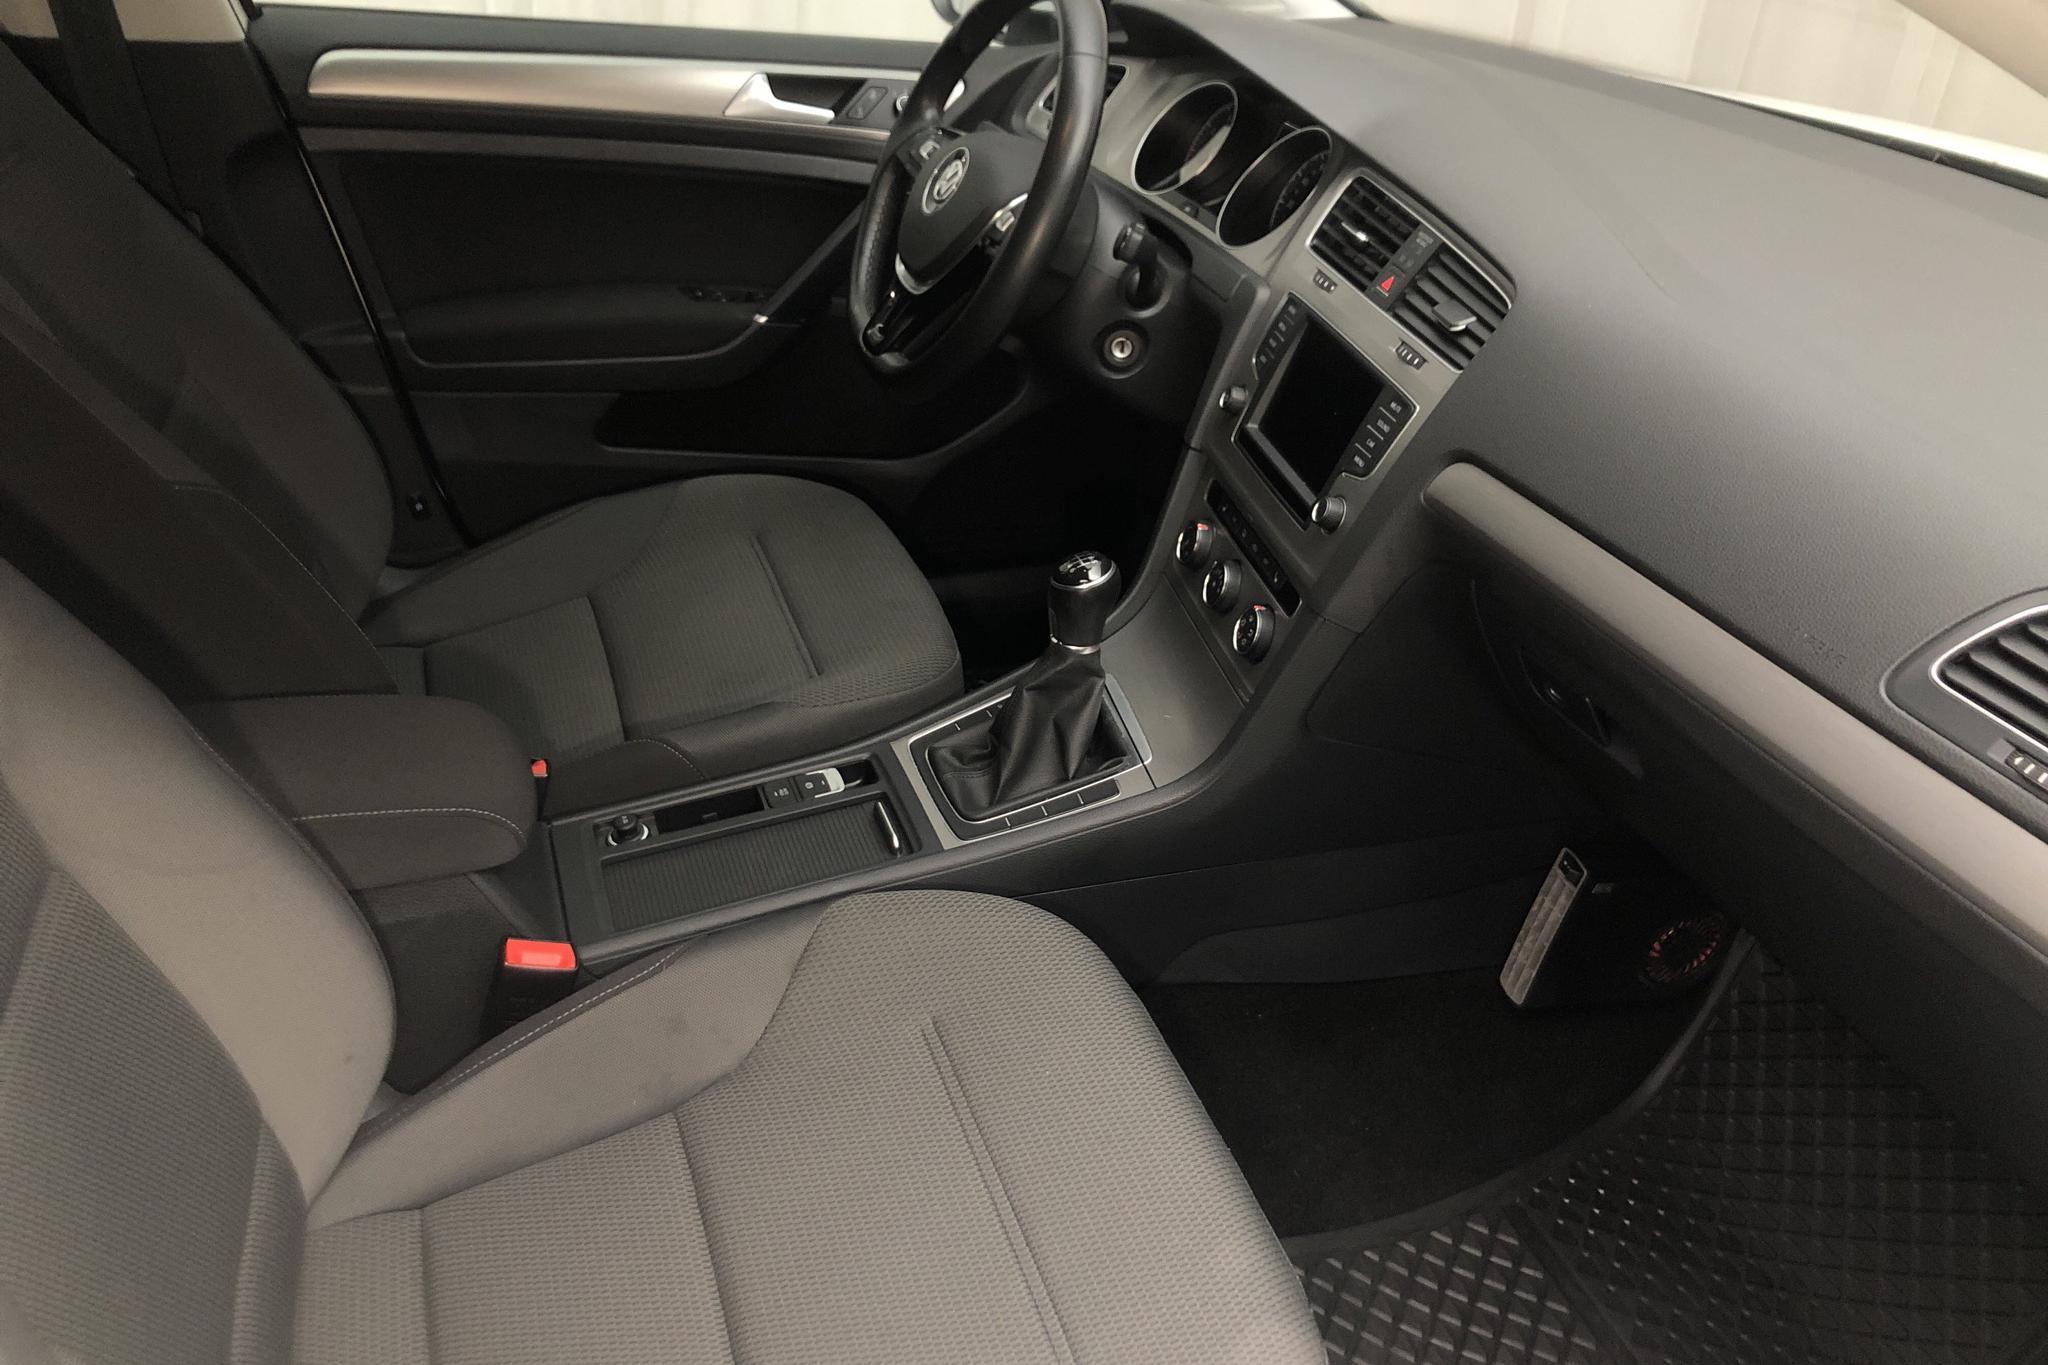 VW Golf VII 1.4 TGI BlueMotion Sportscombi (110hk) - 4 086 mil - Manuell - vit - 2016